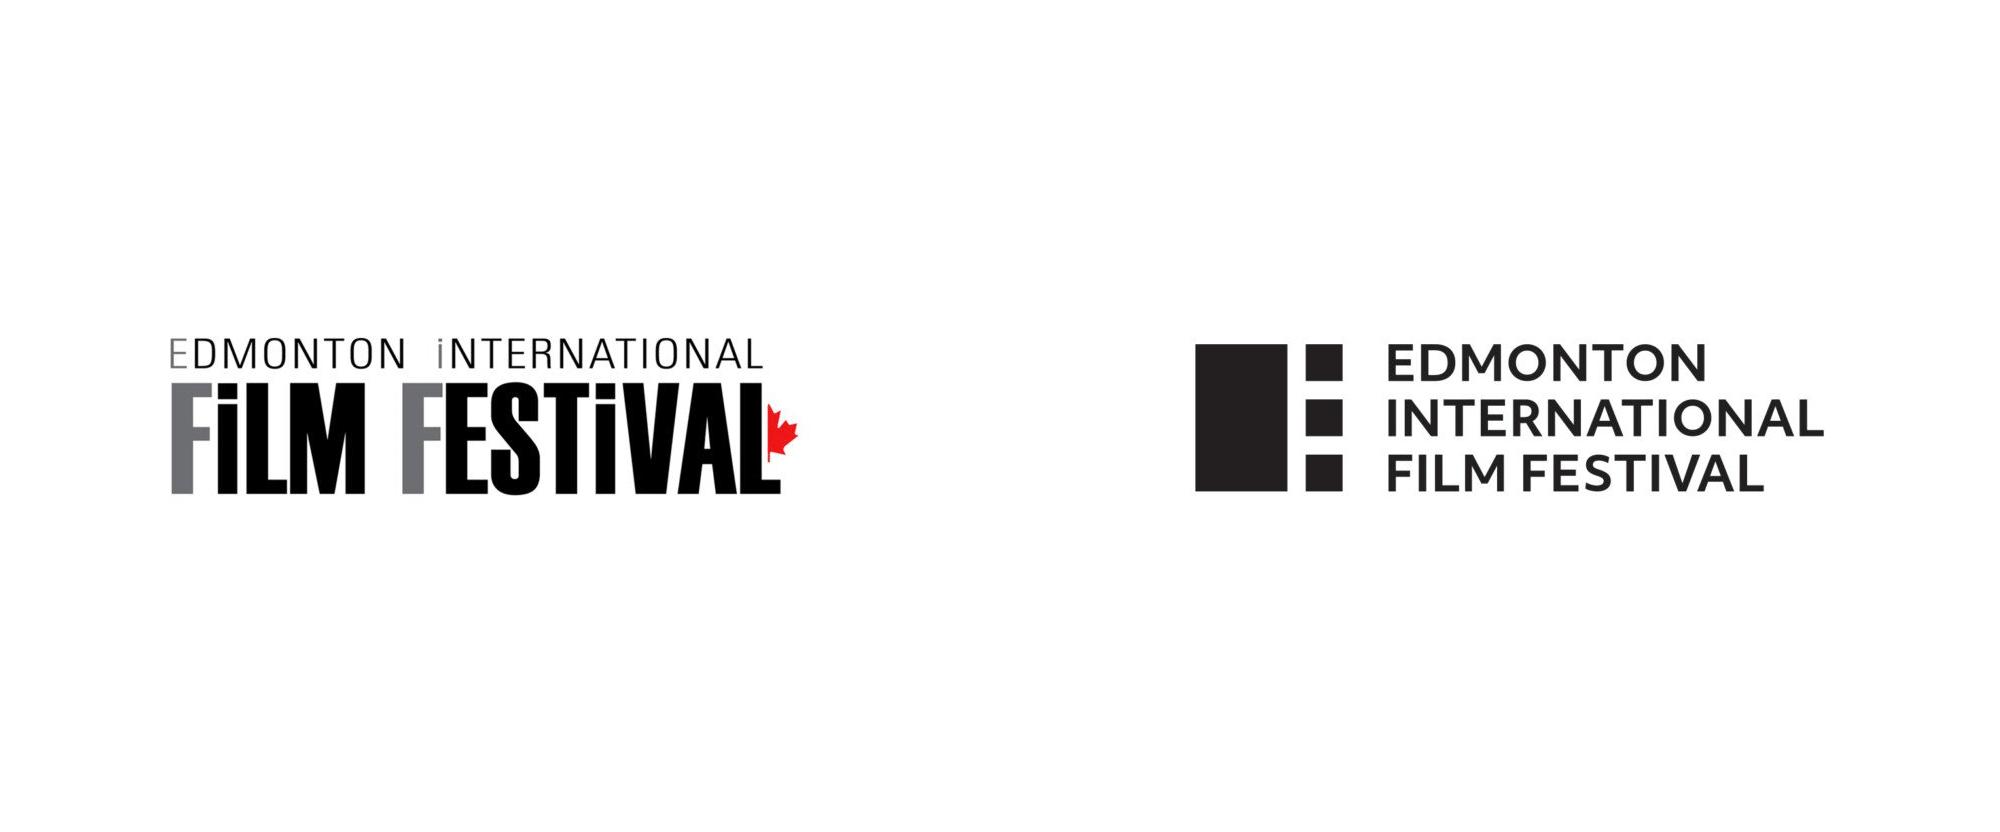 New Logo and Identity for Edmonton International Film Festival by FKA